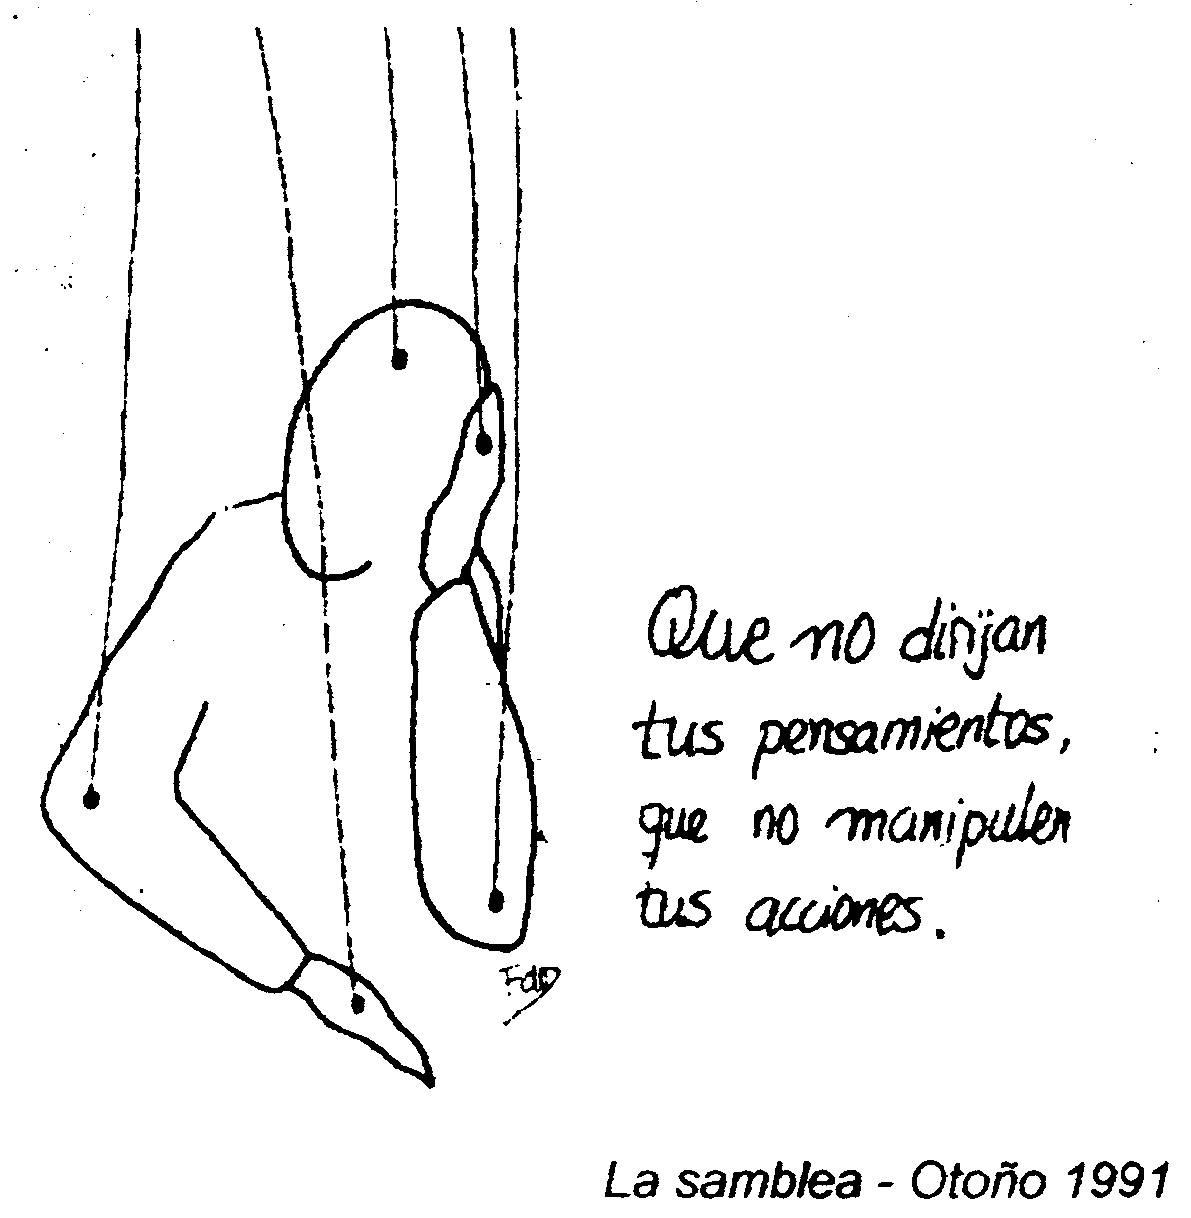 [Image1.jpg]